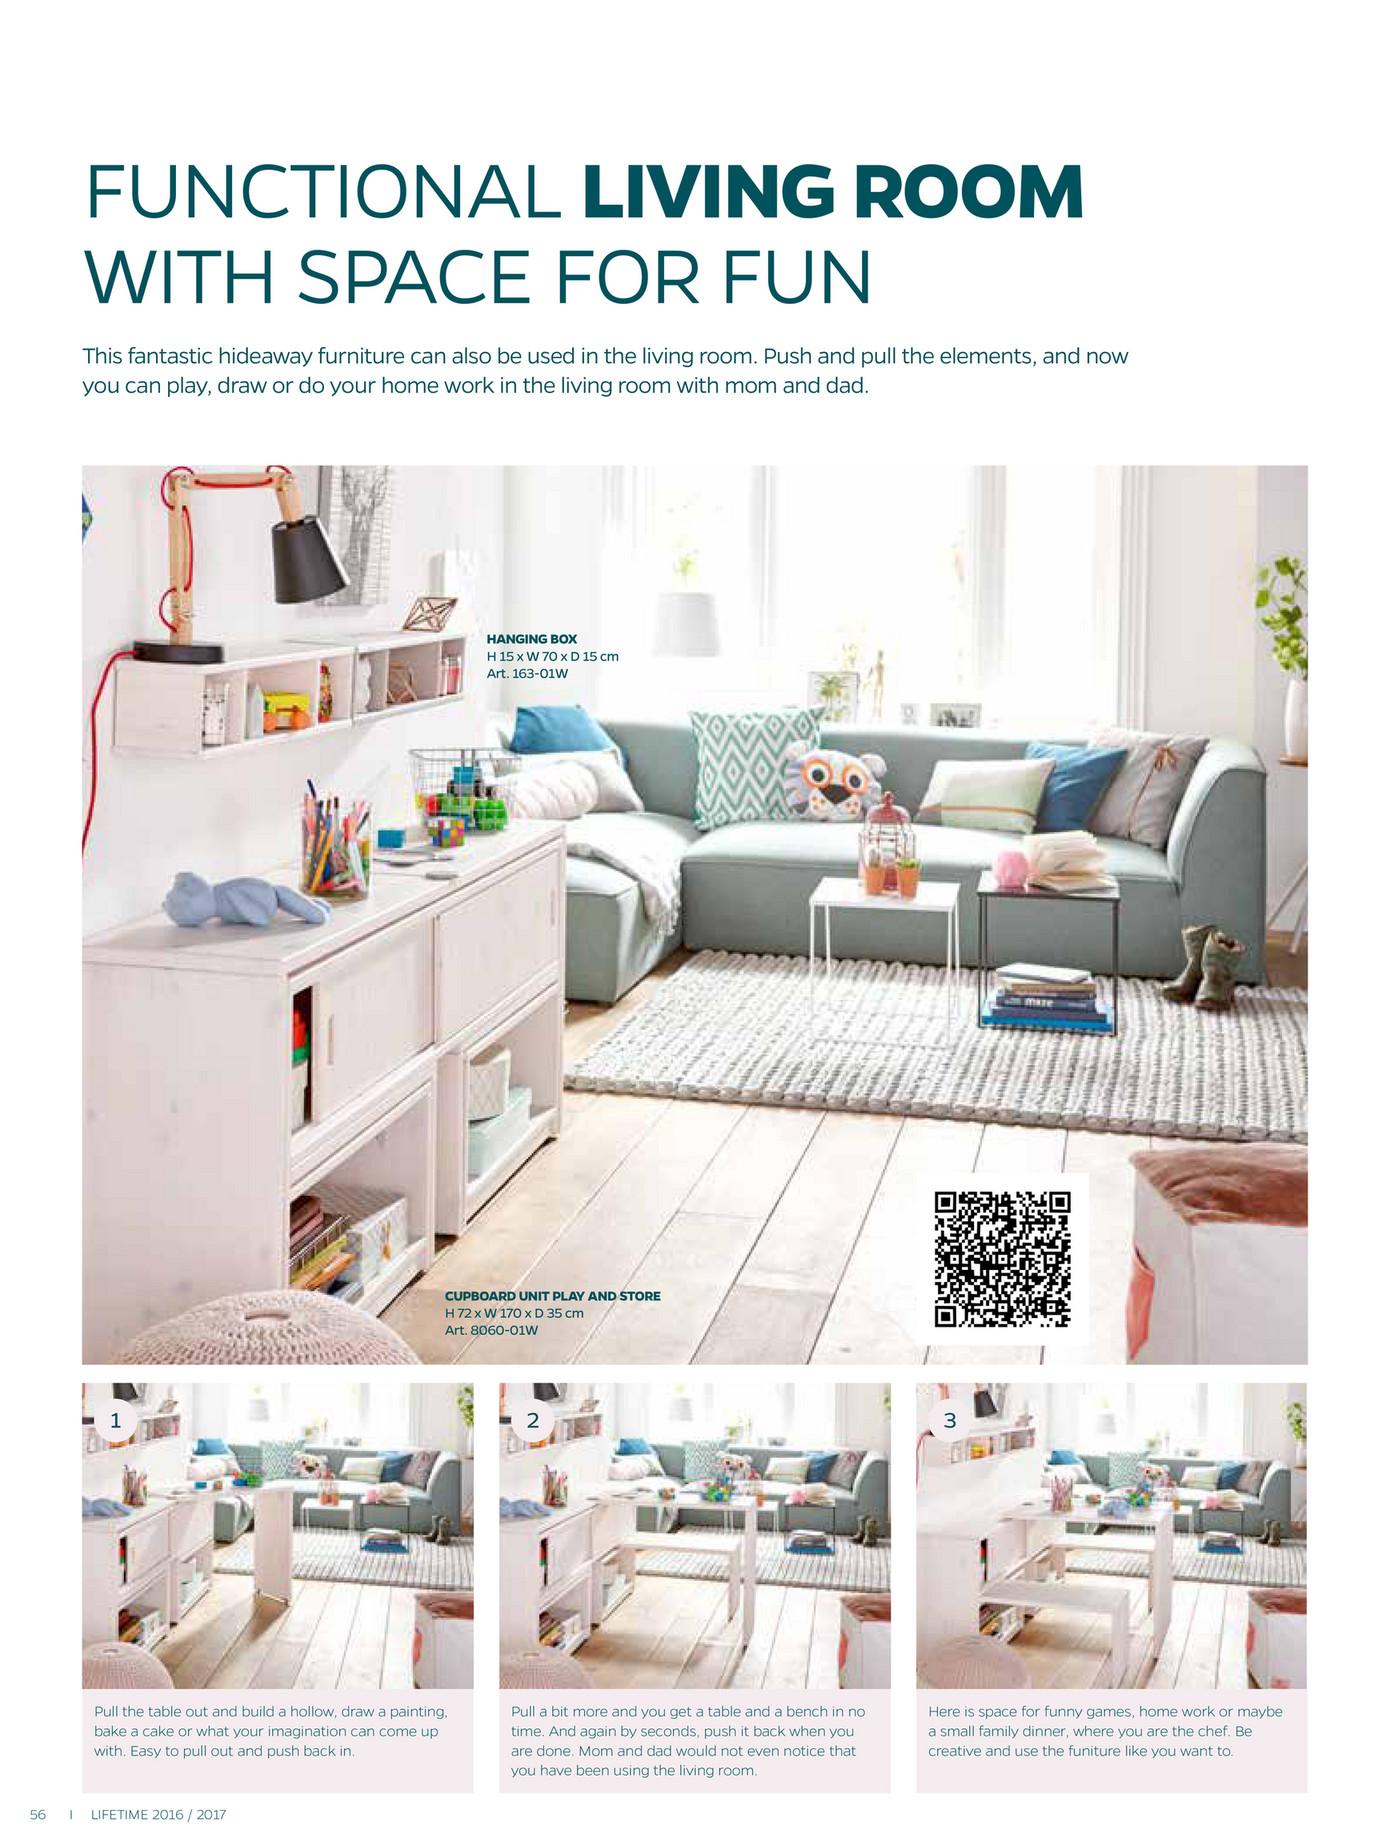 Creative games you can play at homeCreative games you can play at home   Home decor ideas. Games You Can Play In Your Living Room. Home Design Ideas